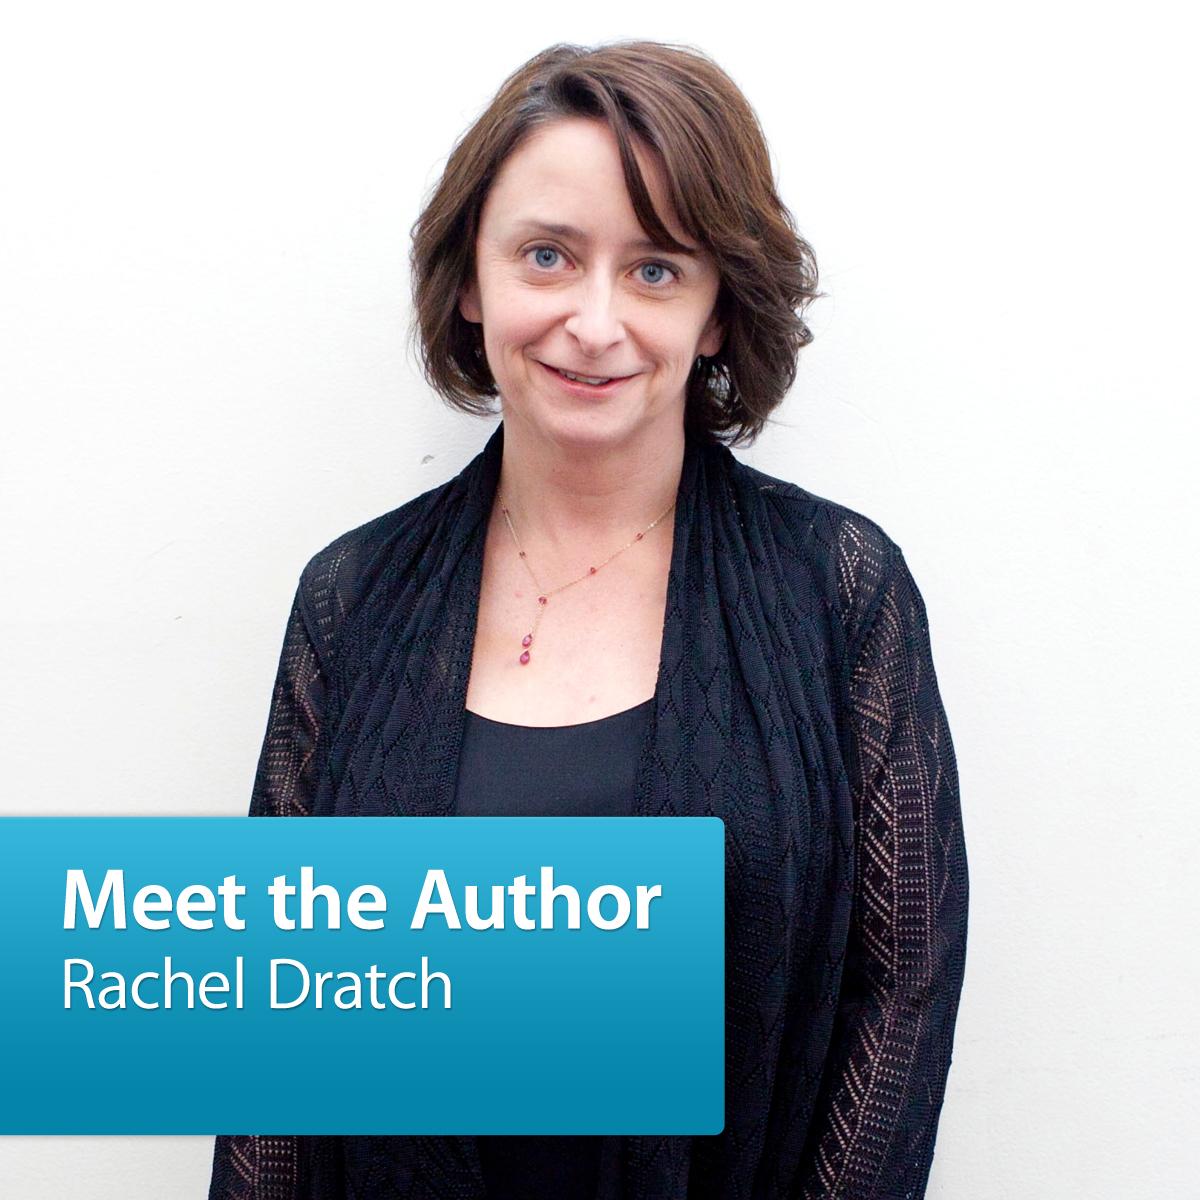 Rachel Dratch: Meet the Author